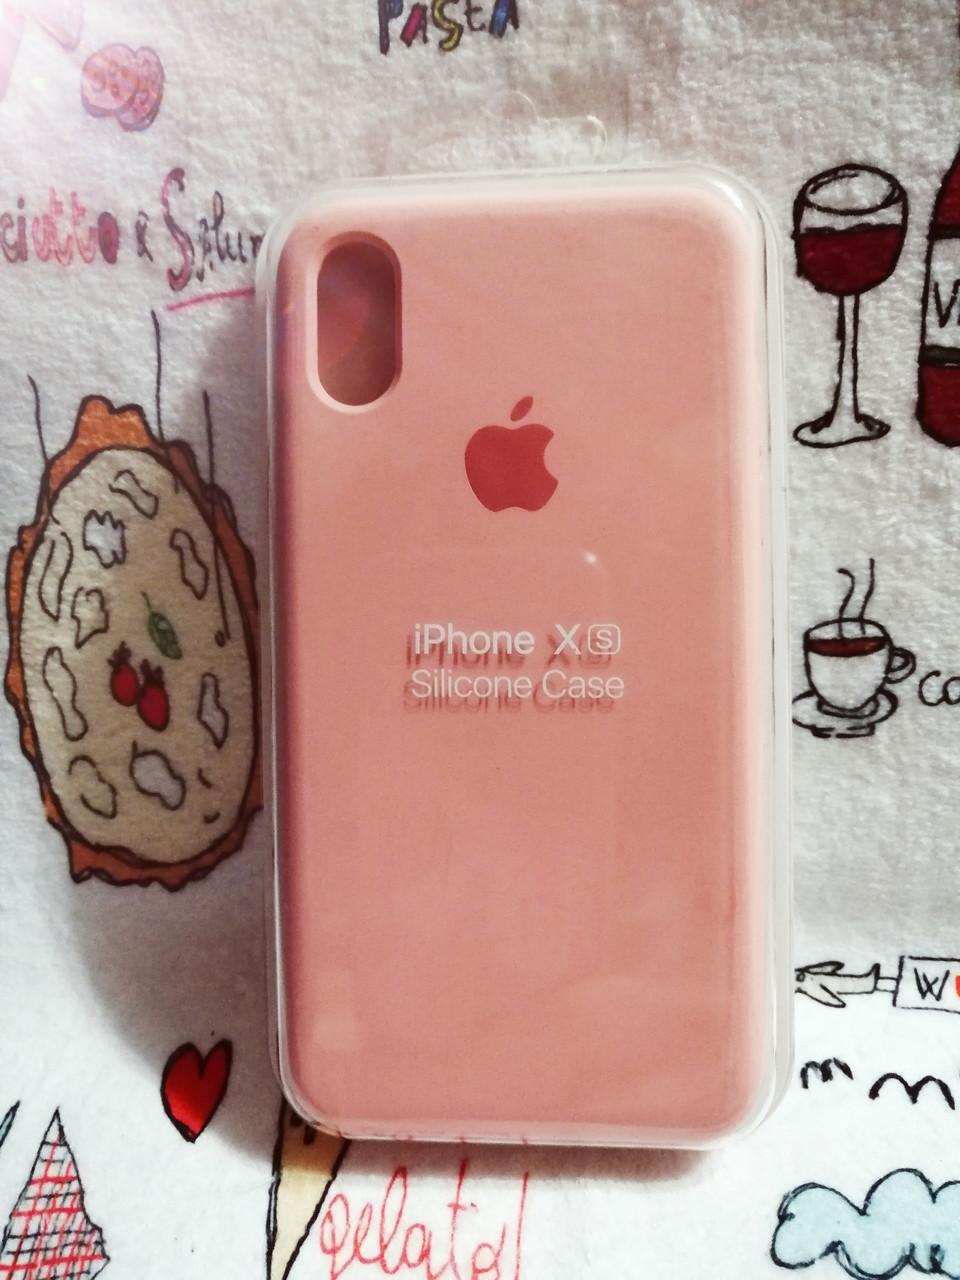 Чехол iPhone X / Xs Soft Touch Silicone Case с микрофиброй внутри (MKX32FE) - Color 10